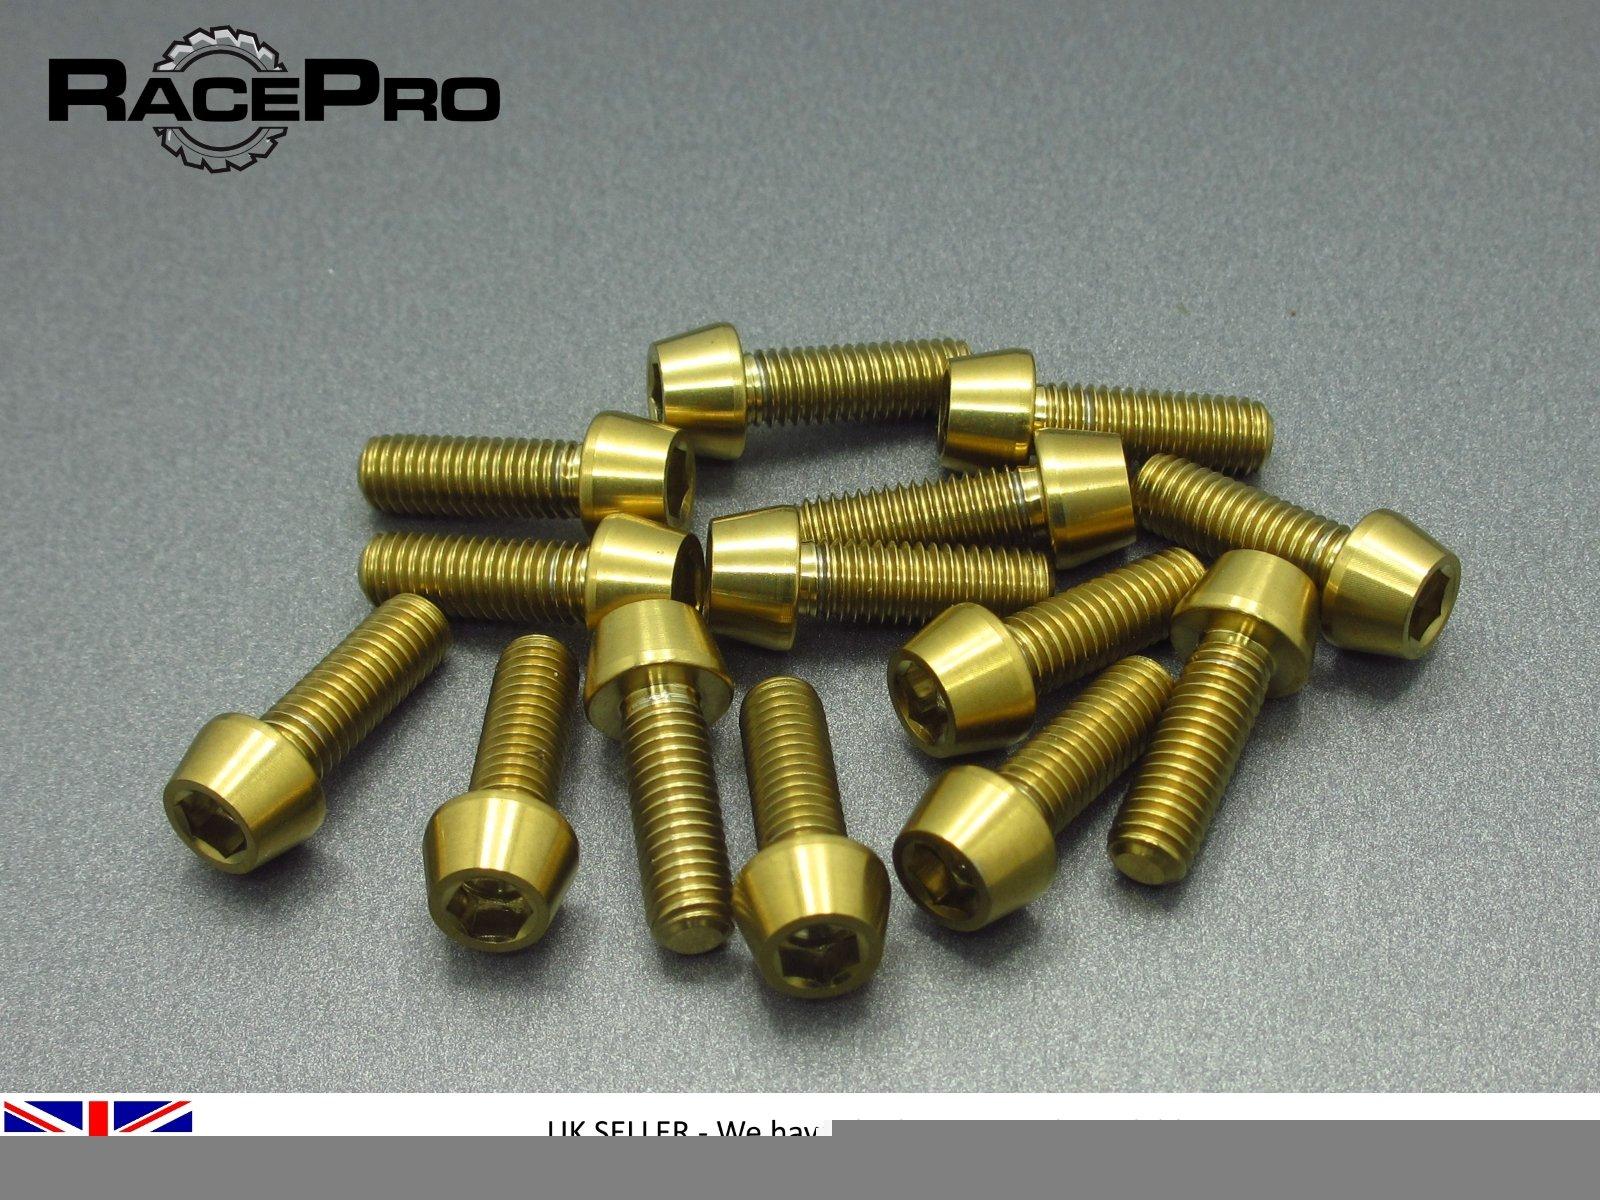 4x Titanium  Parallel Socket Bolt Allen RacePro M4 x 10mm x 0.7mm Green